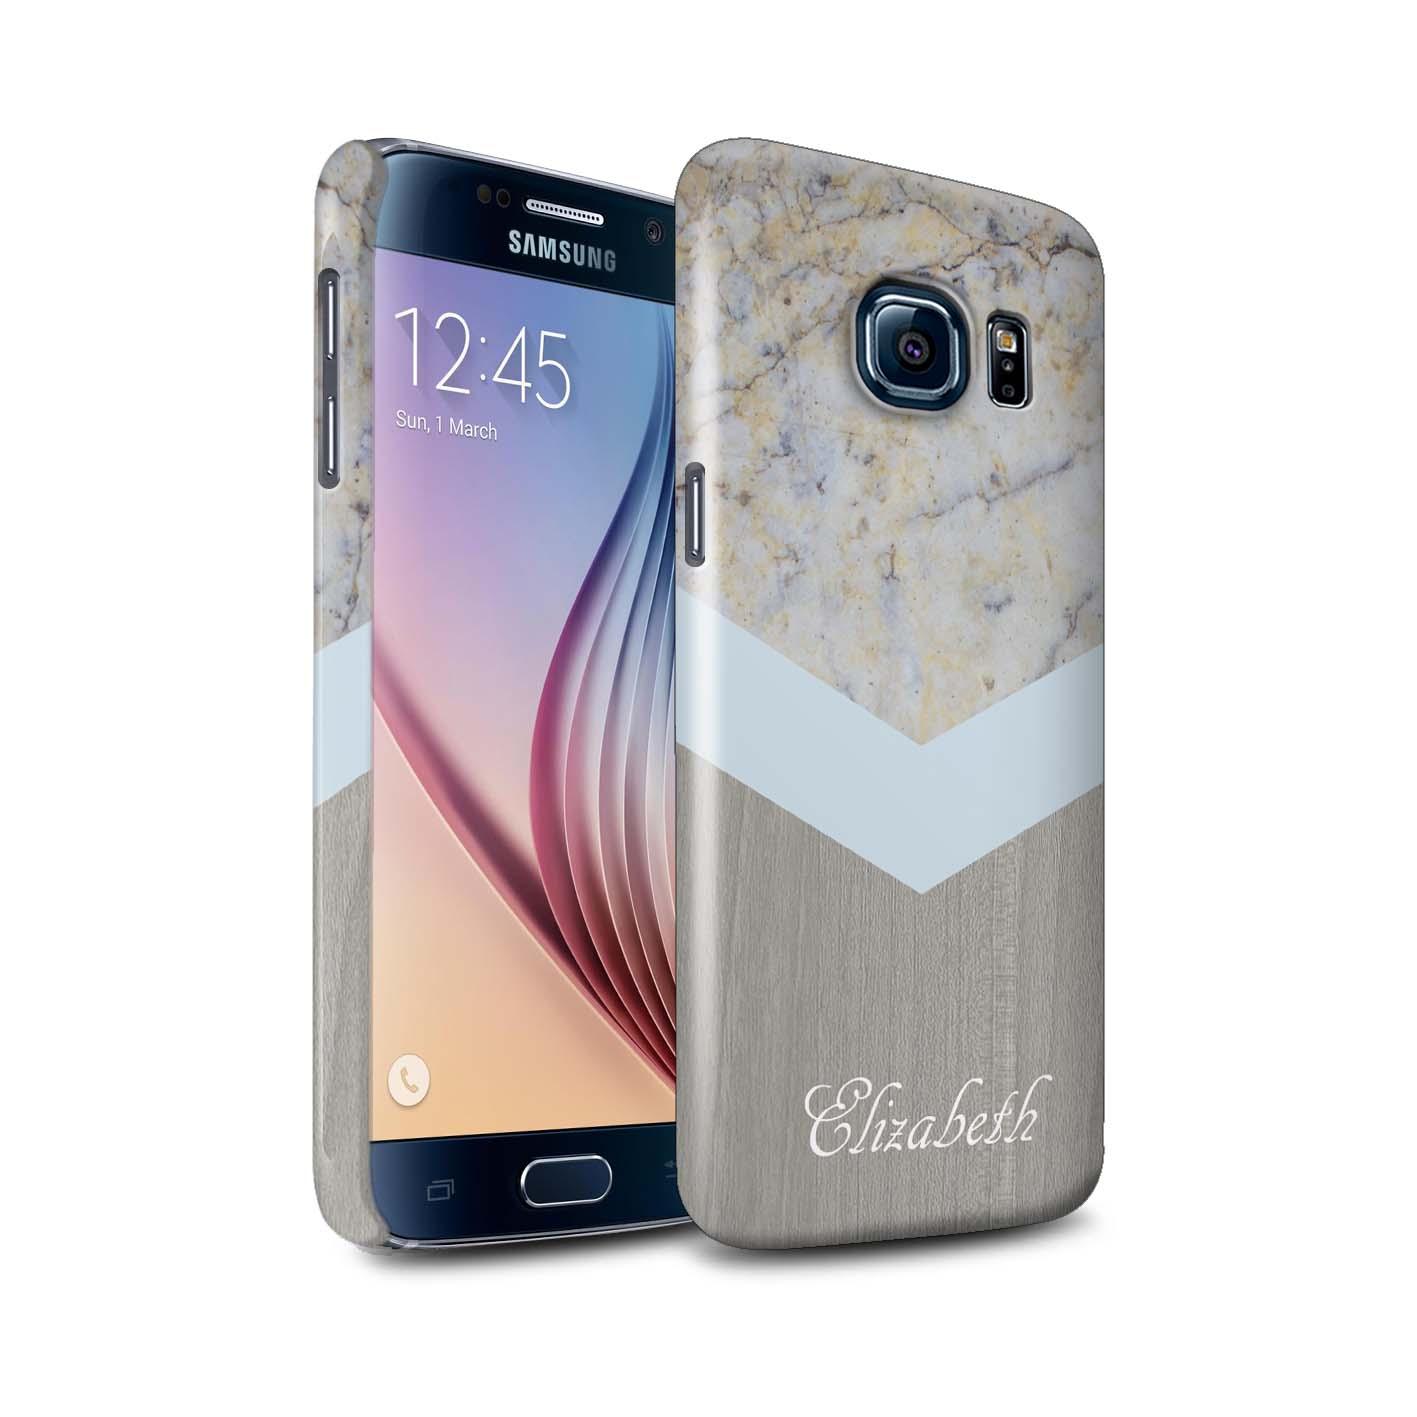 Personnalise-Marbre-Bois-Coutume-Coque-Brillant-pour-Samsung-Galaxy-S6-G920